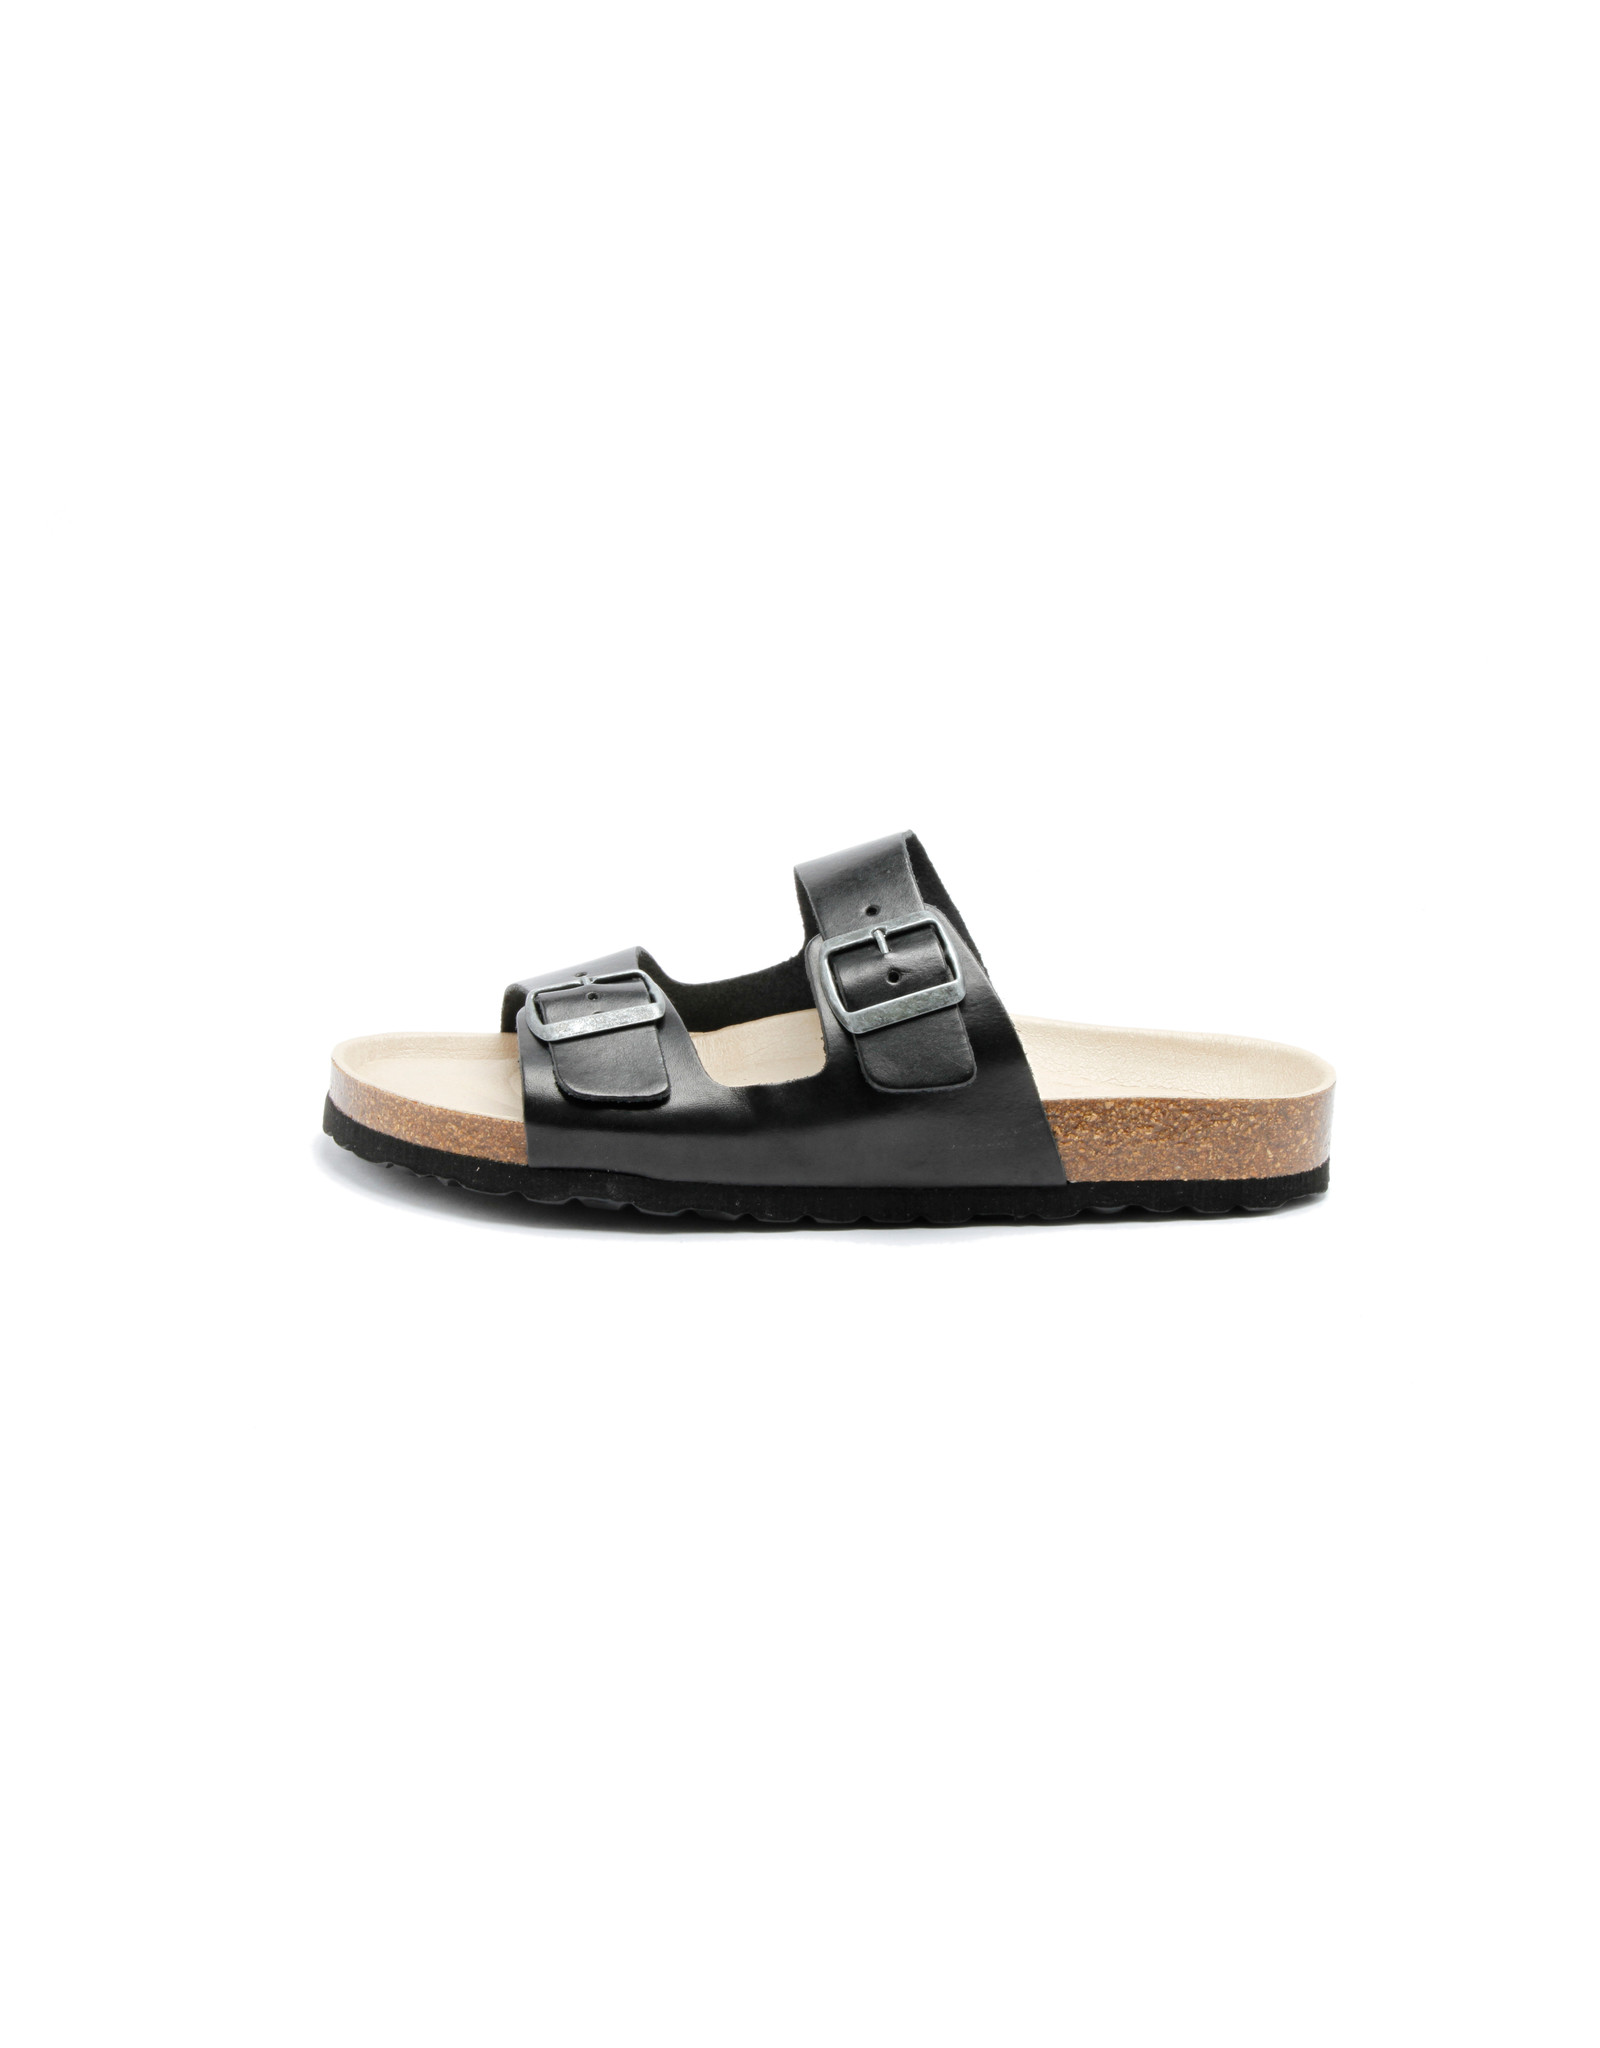 Grand Step Shoes Linda Slides - Copy